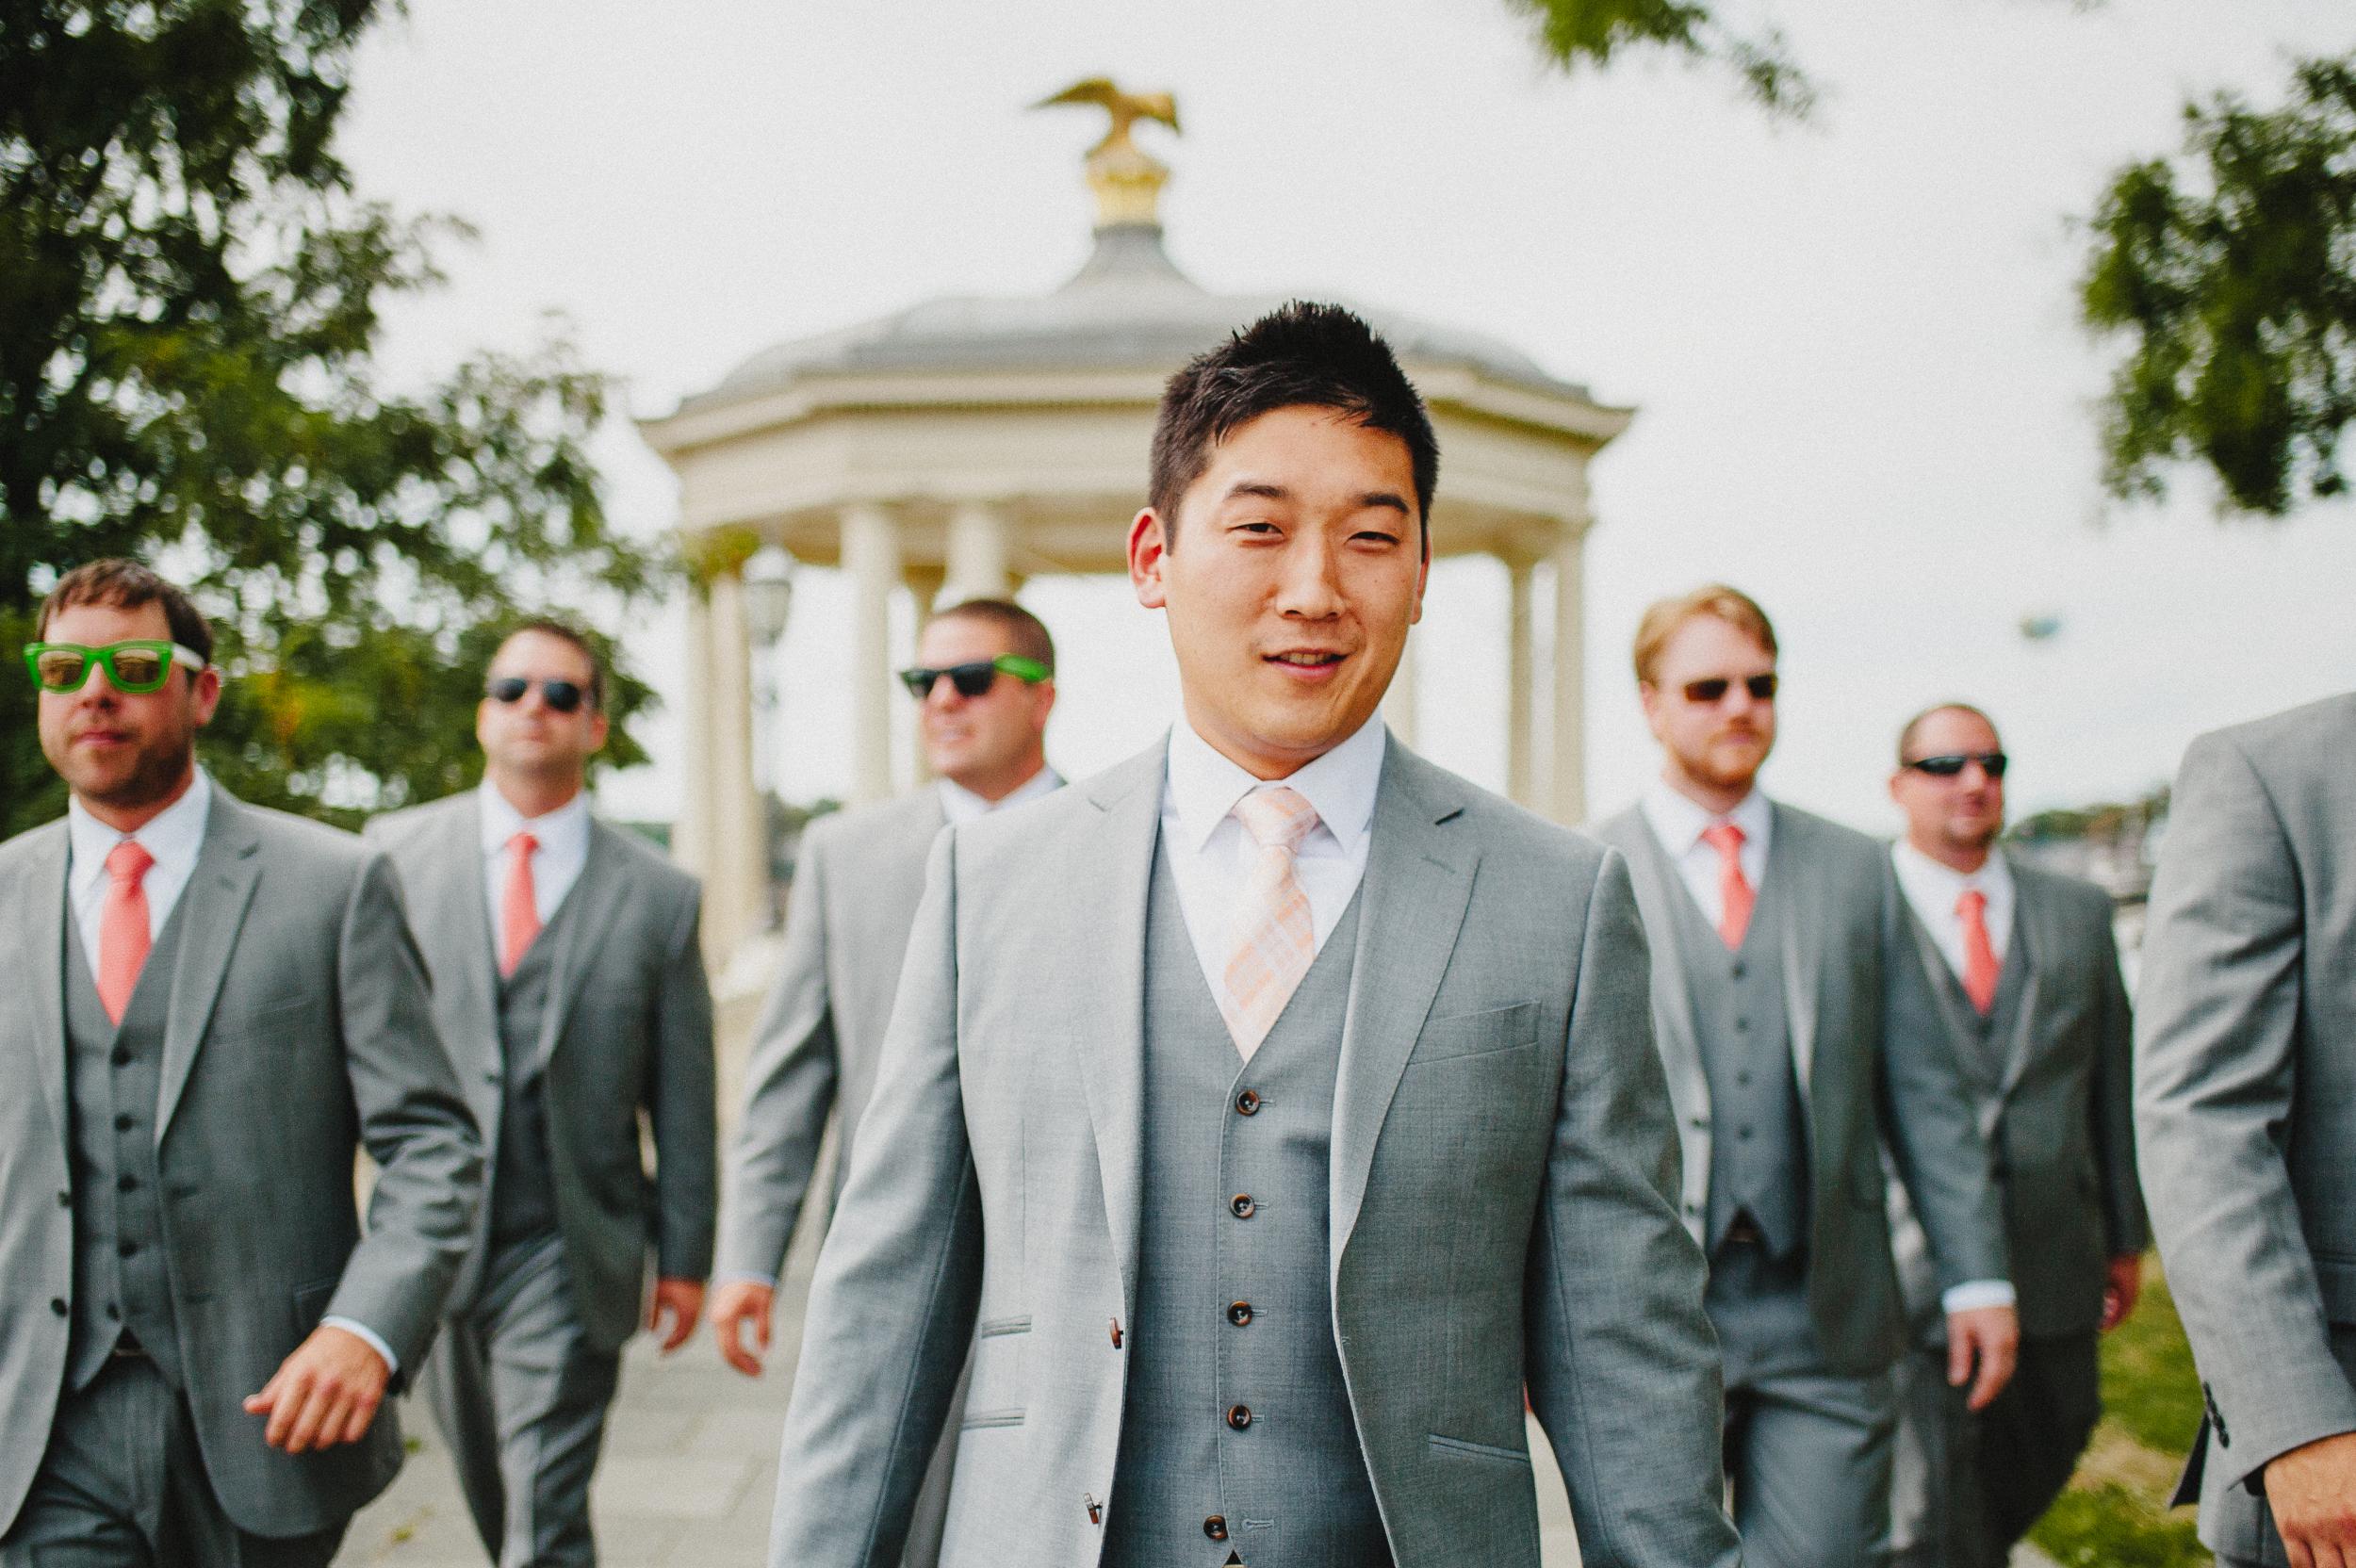 union-trust-philadelphia-wedding-photographer-33.jpg